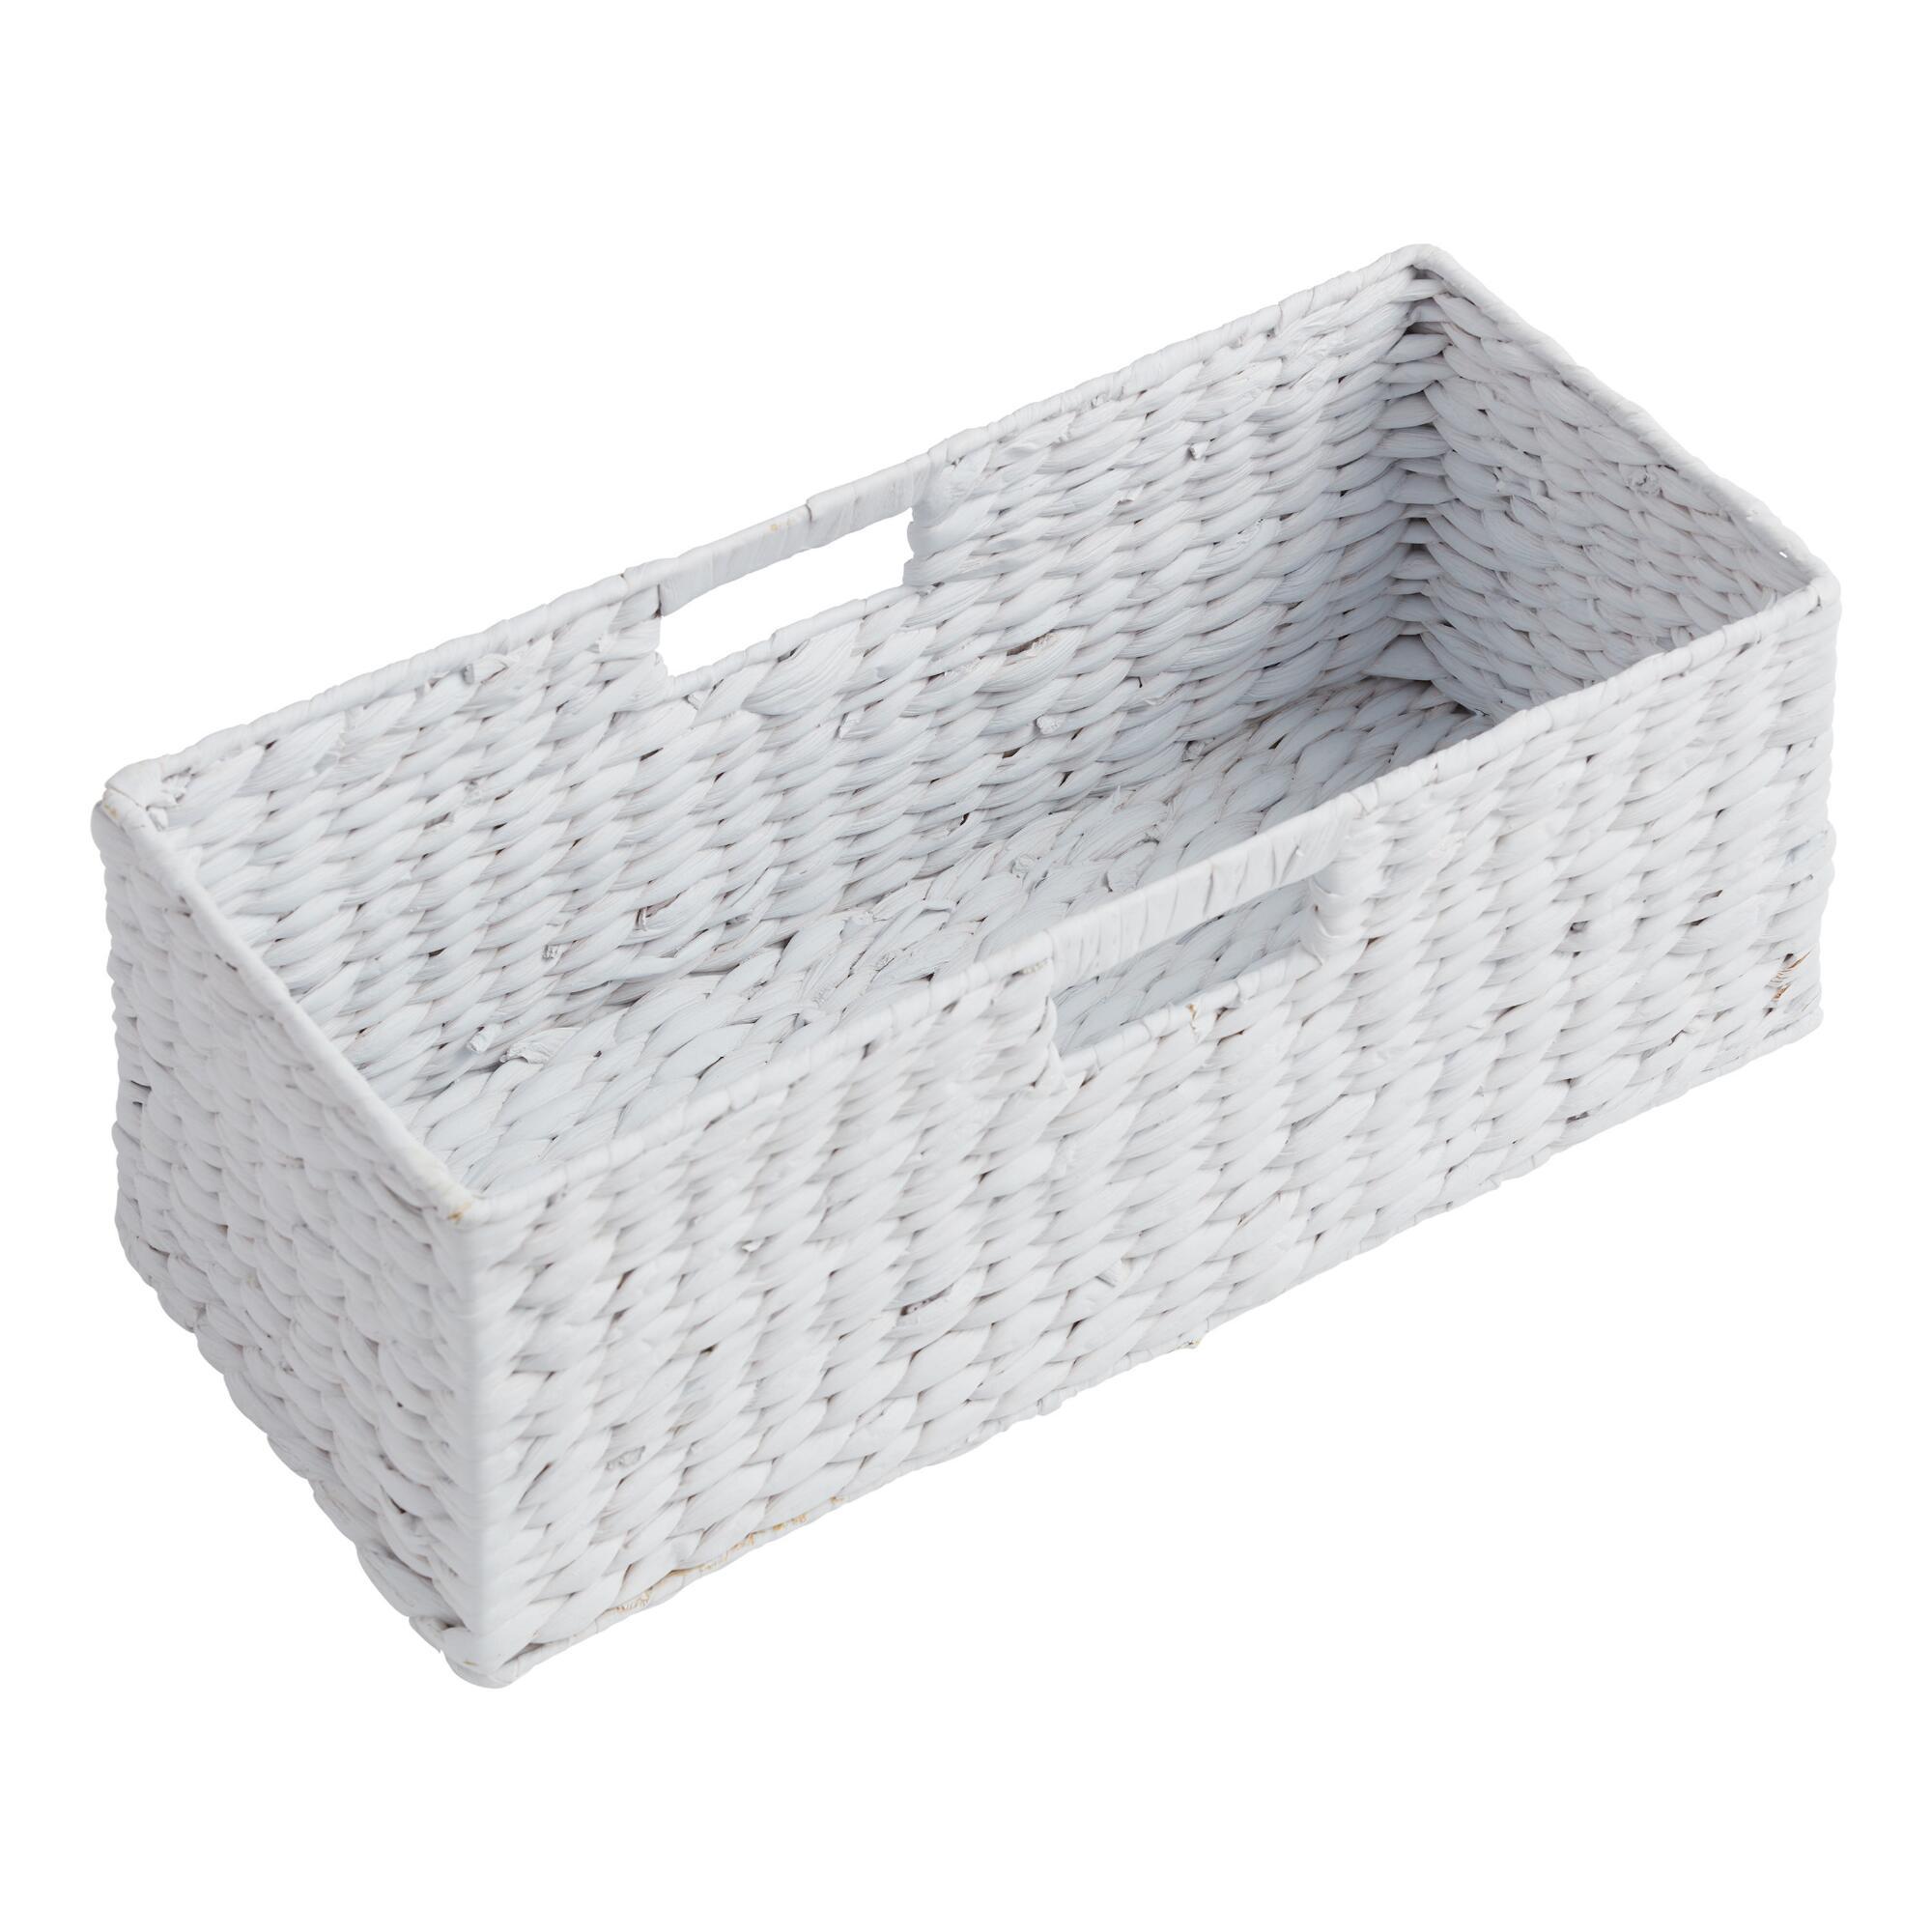 Hyacinth Elliot Utility Basket $12.99